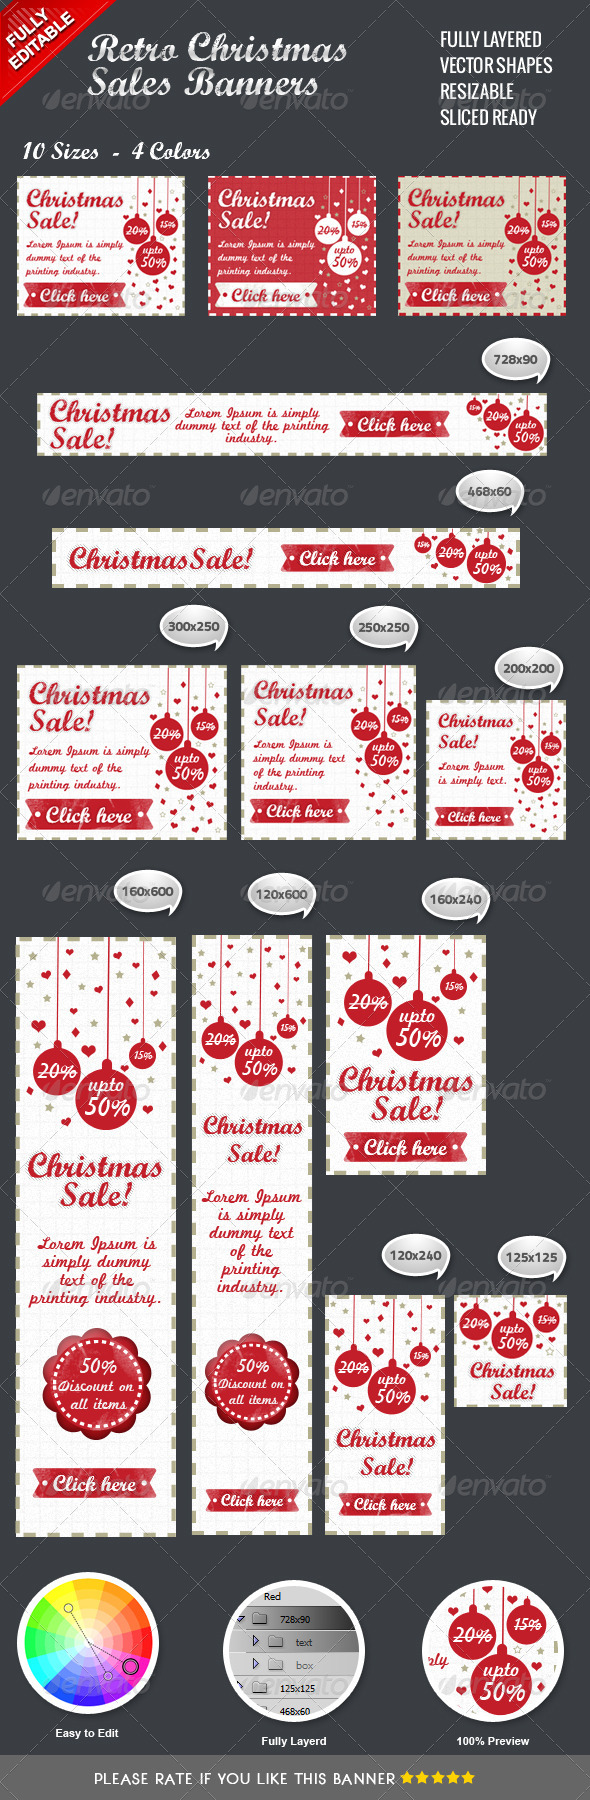 GraphicRiver Retro Christmas Sales Banners 3512374